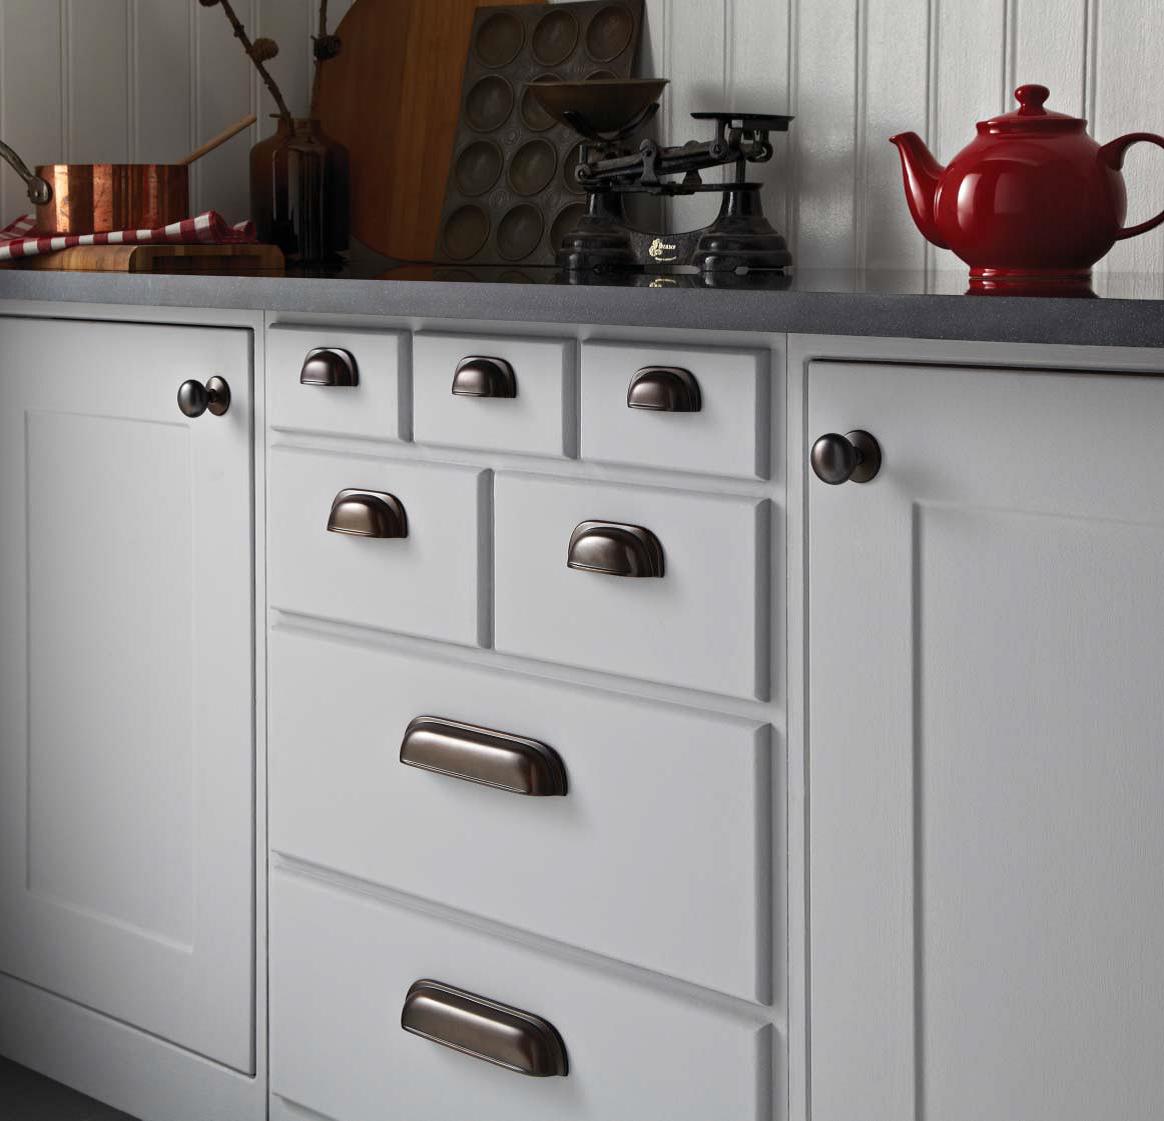 door knobs for kitchen cabinets photo - 6